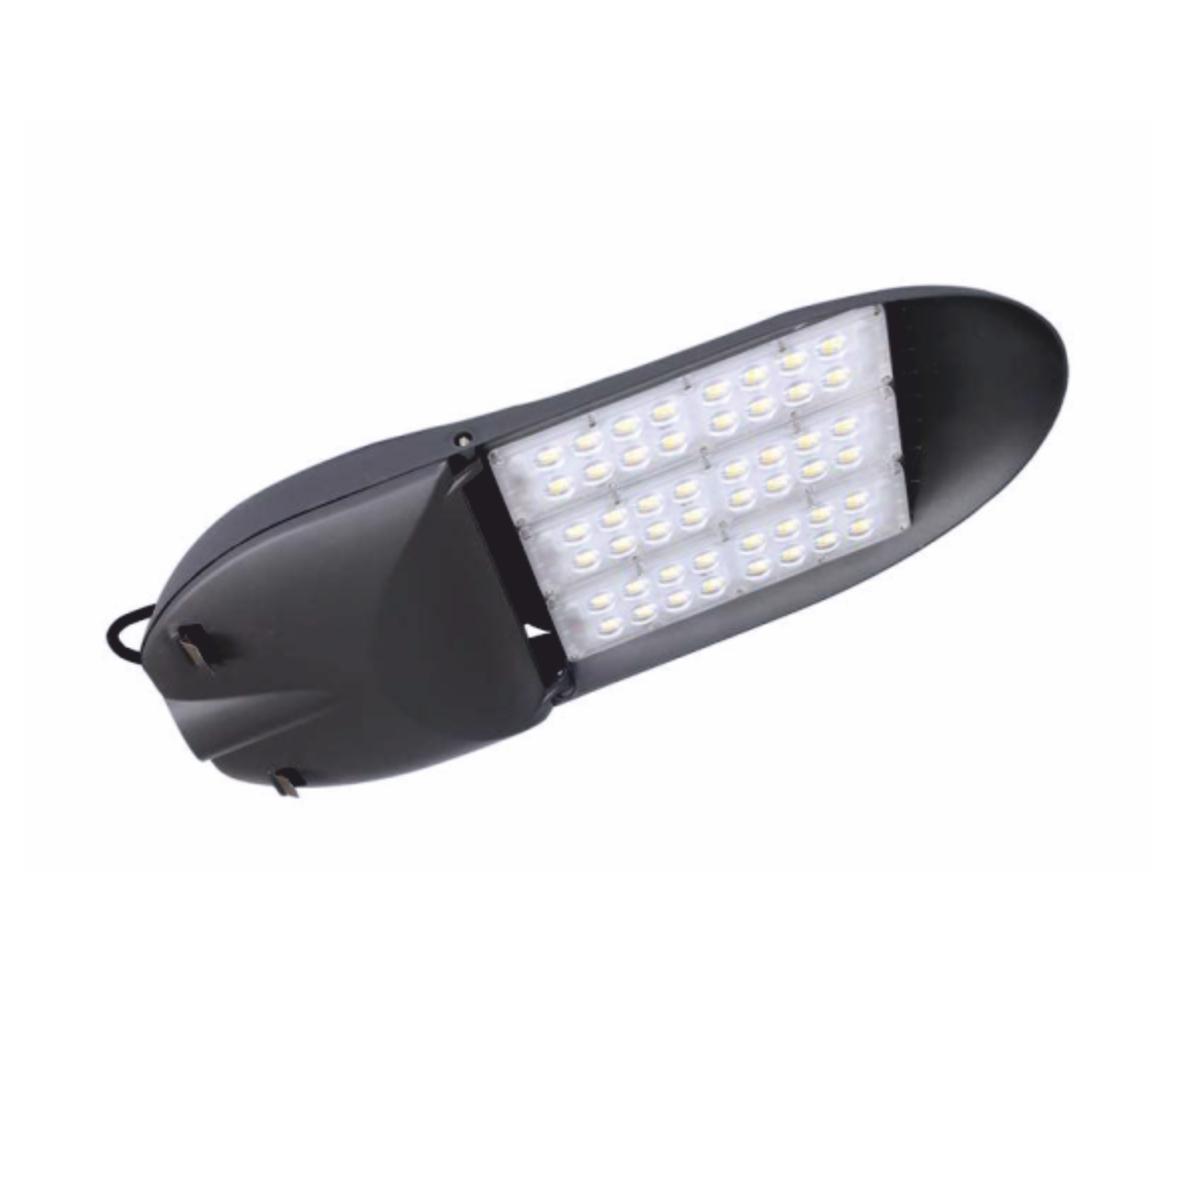 Тех описание светодиодного модуля